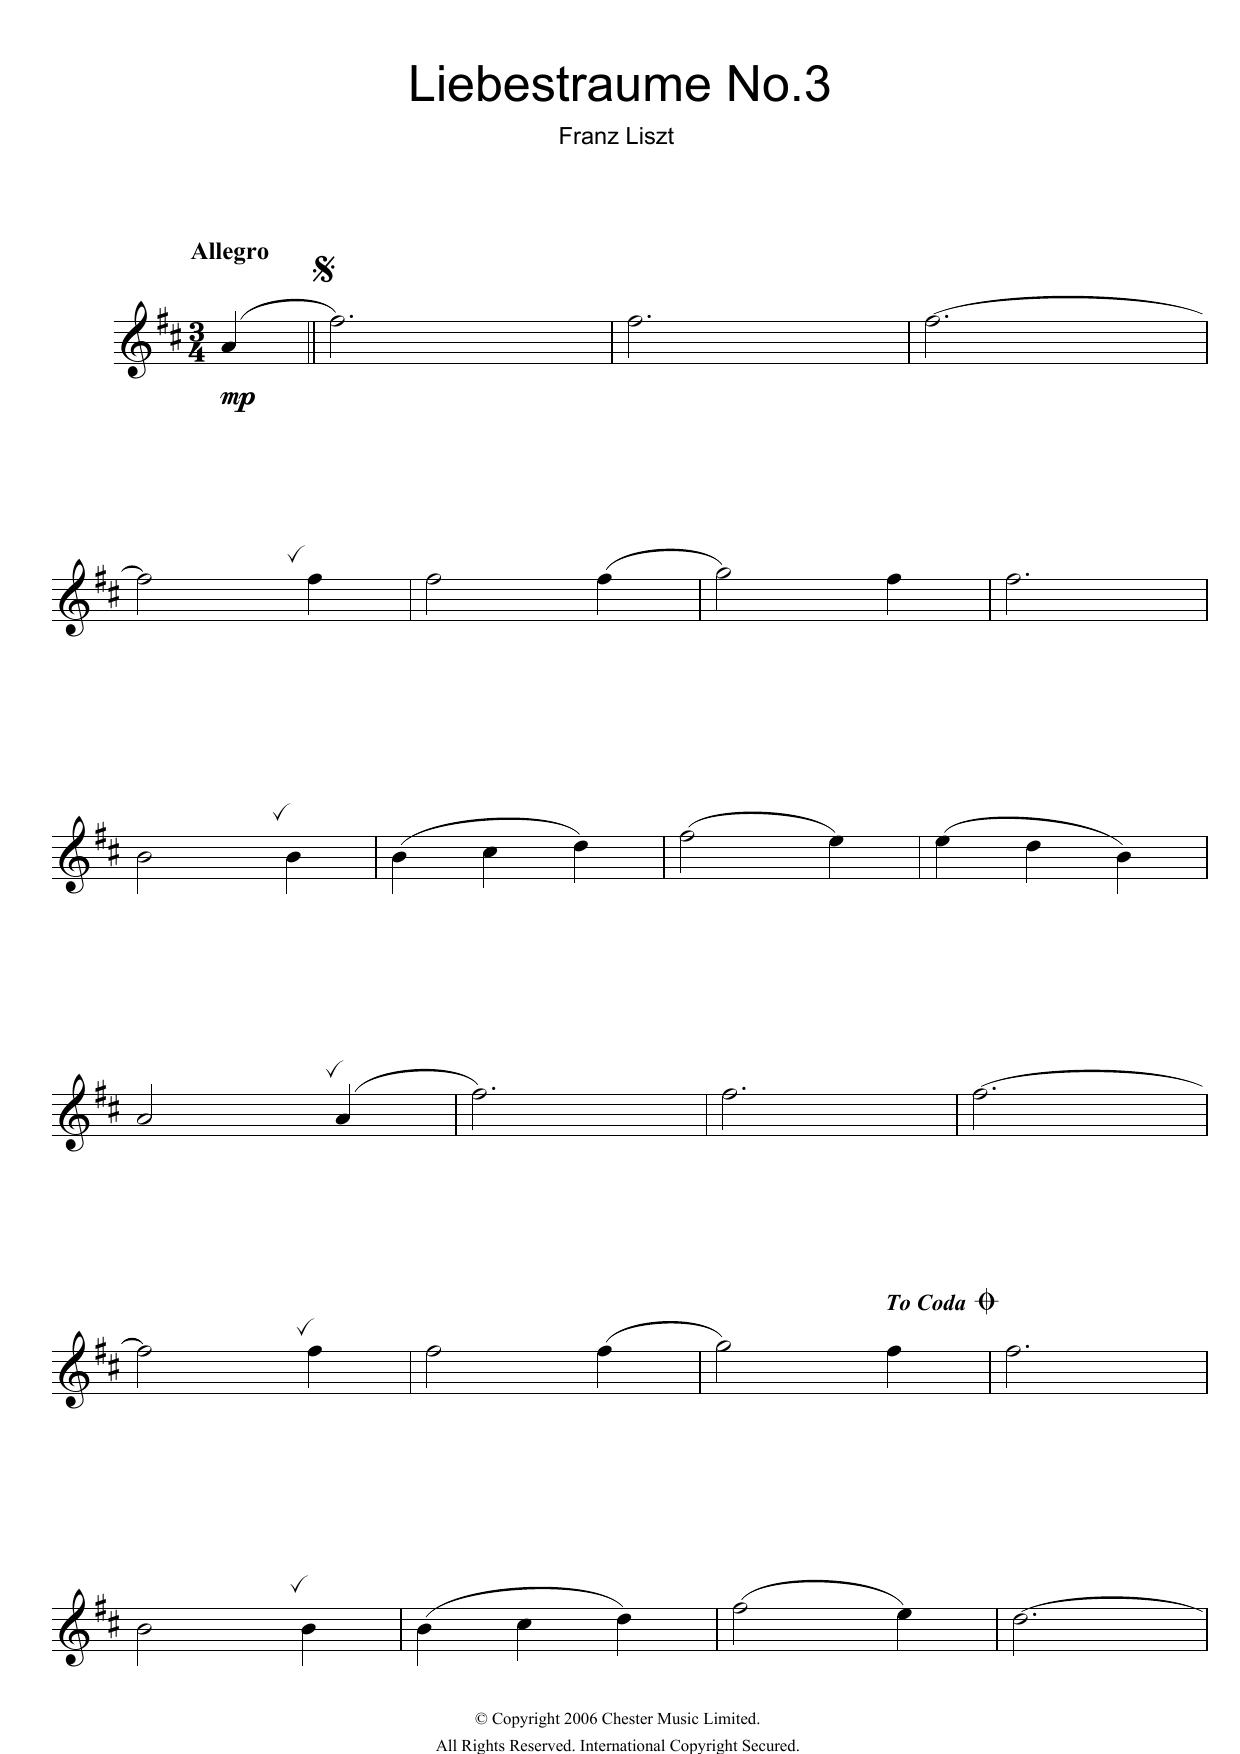 Franz Liszt - Liebestraume: Notturno No.3 In A Flat: O Lieb, So Lang Du Lieben...